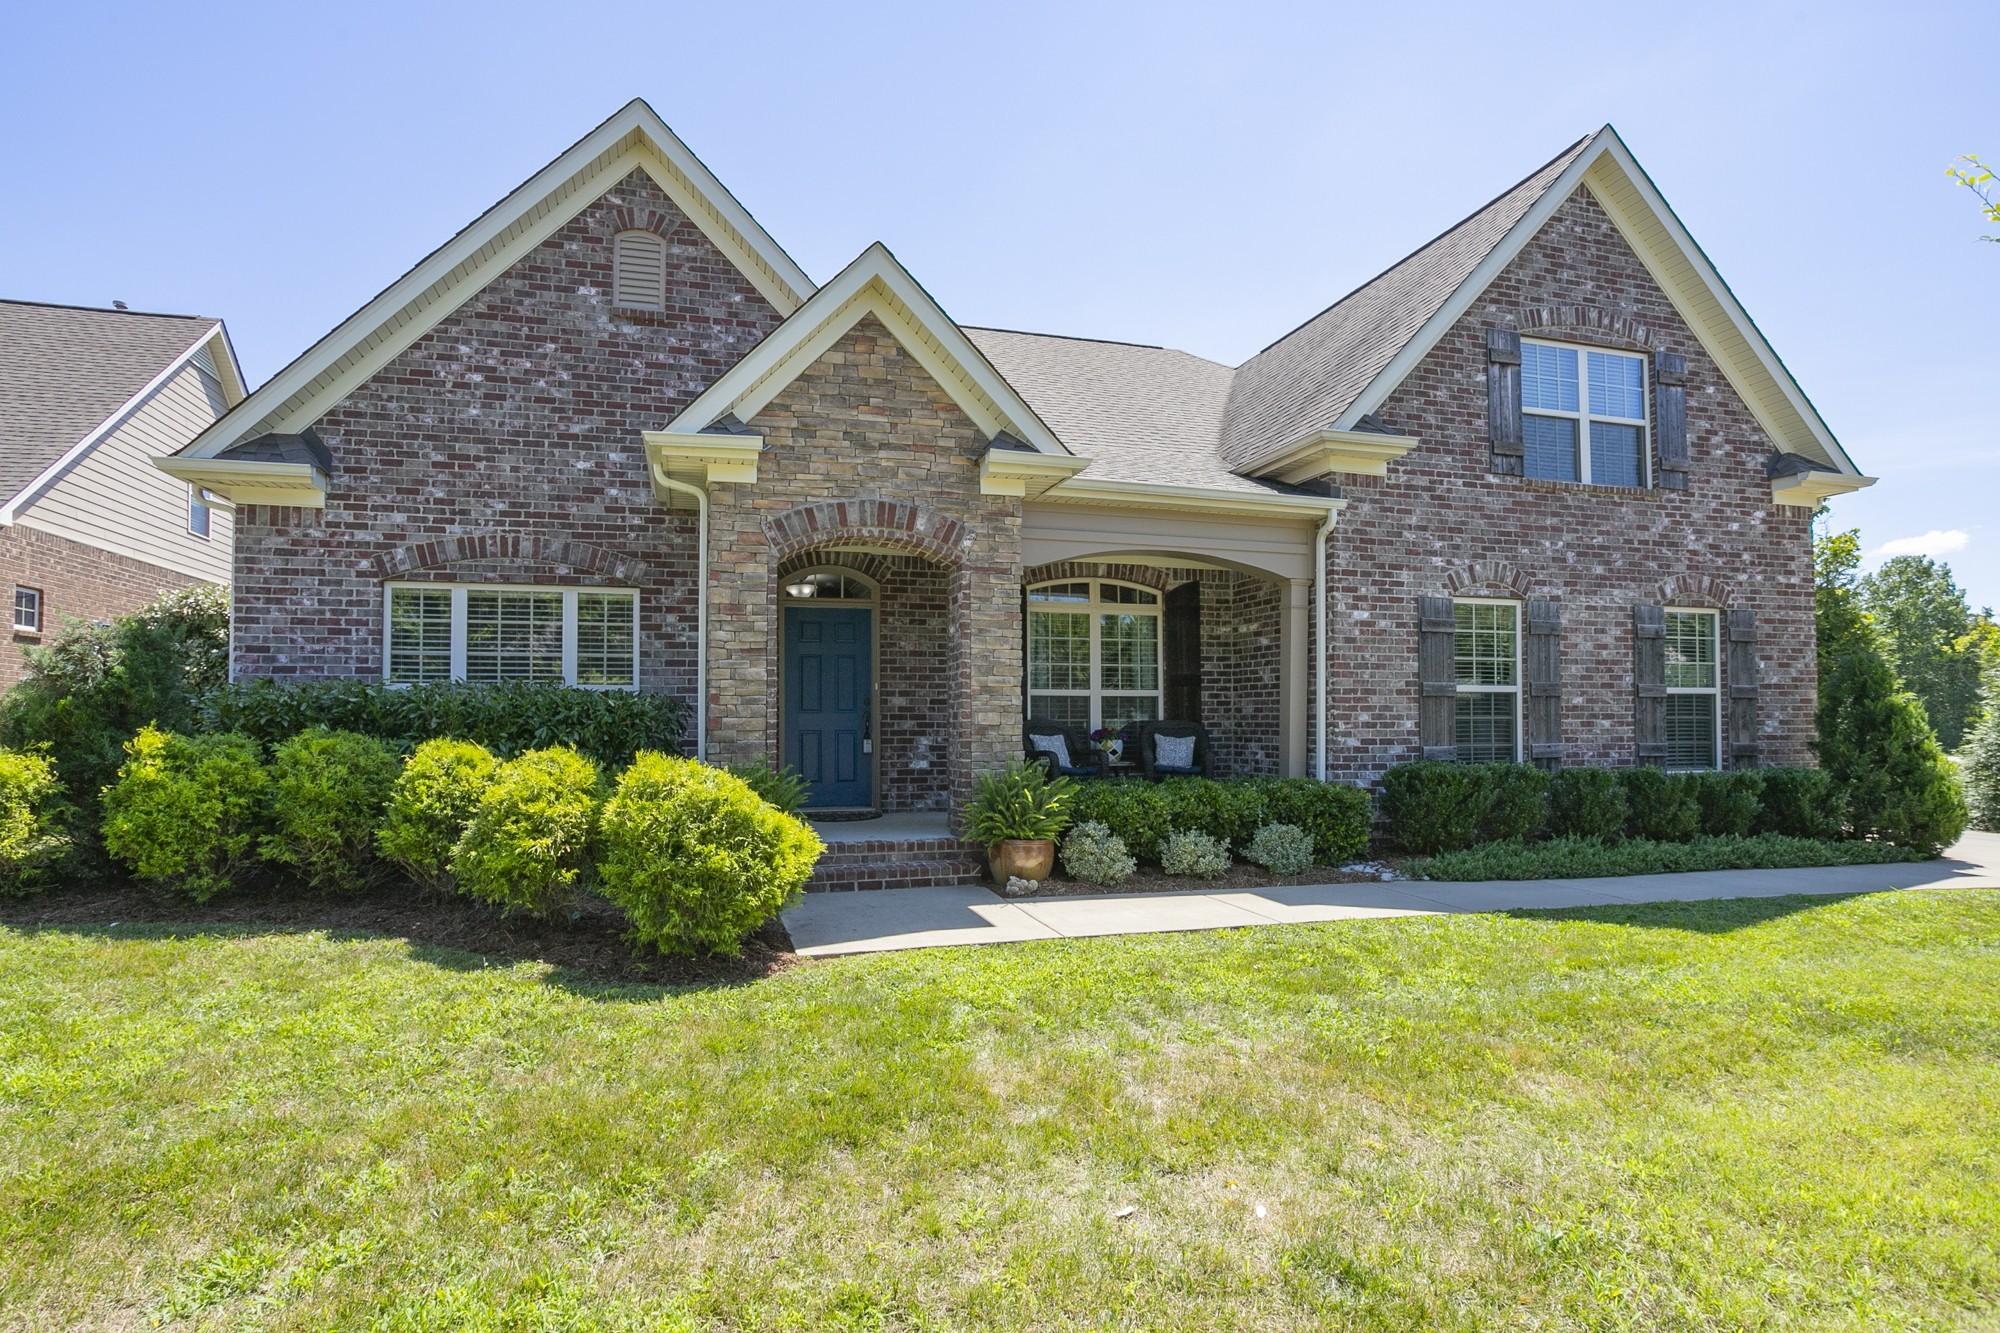 2181 Kirkwall Dr Property Photo - Nolensville, TN real estate listing